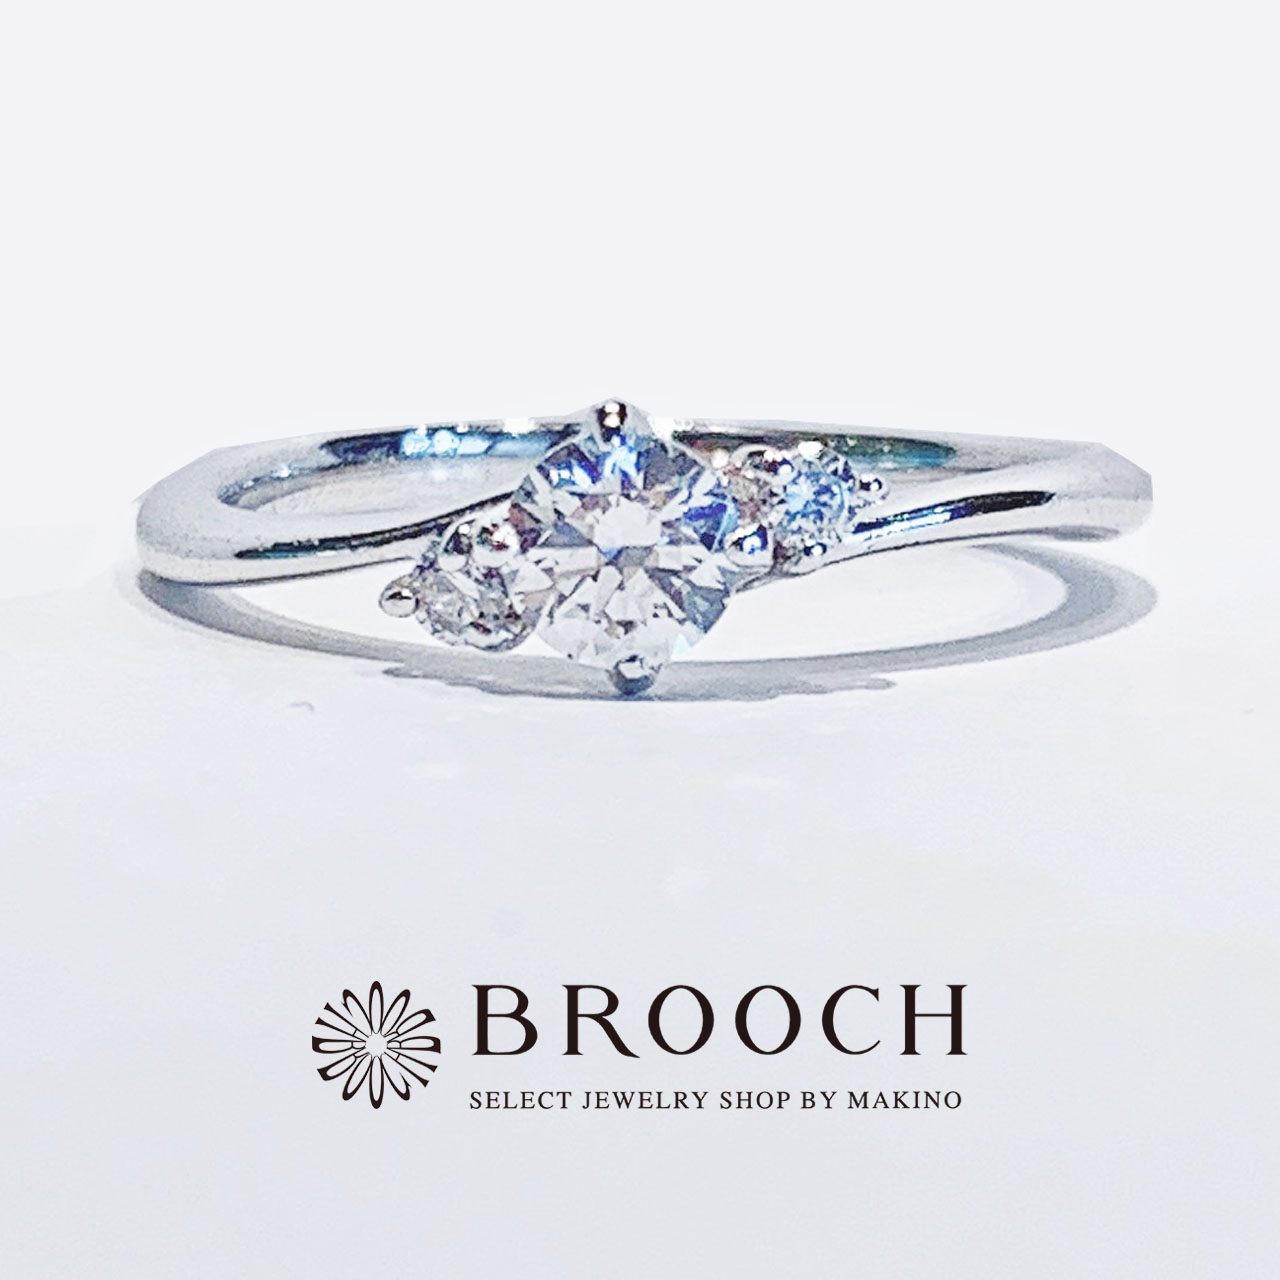 BROOCH 婚約指輪 エンゲージリング かわいい シンプルウェーブデザイン